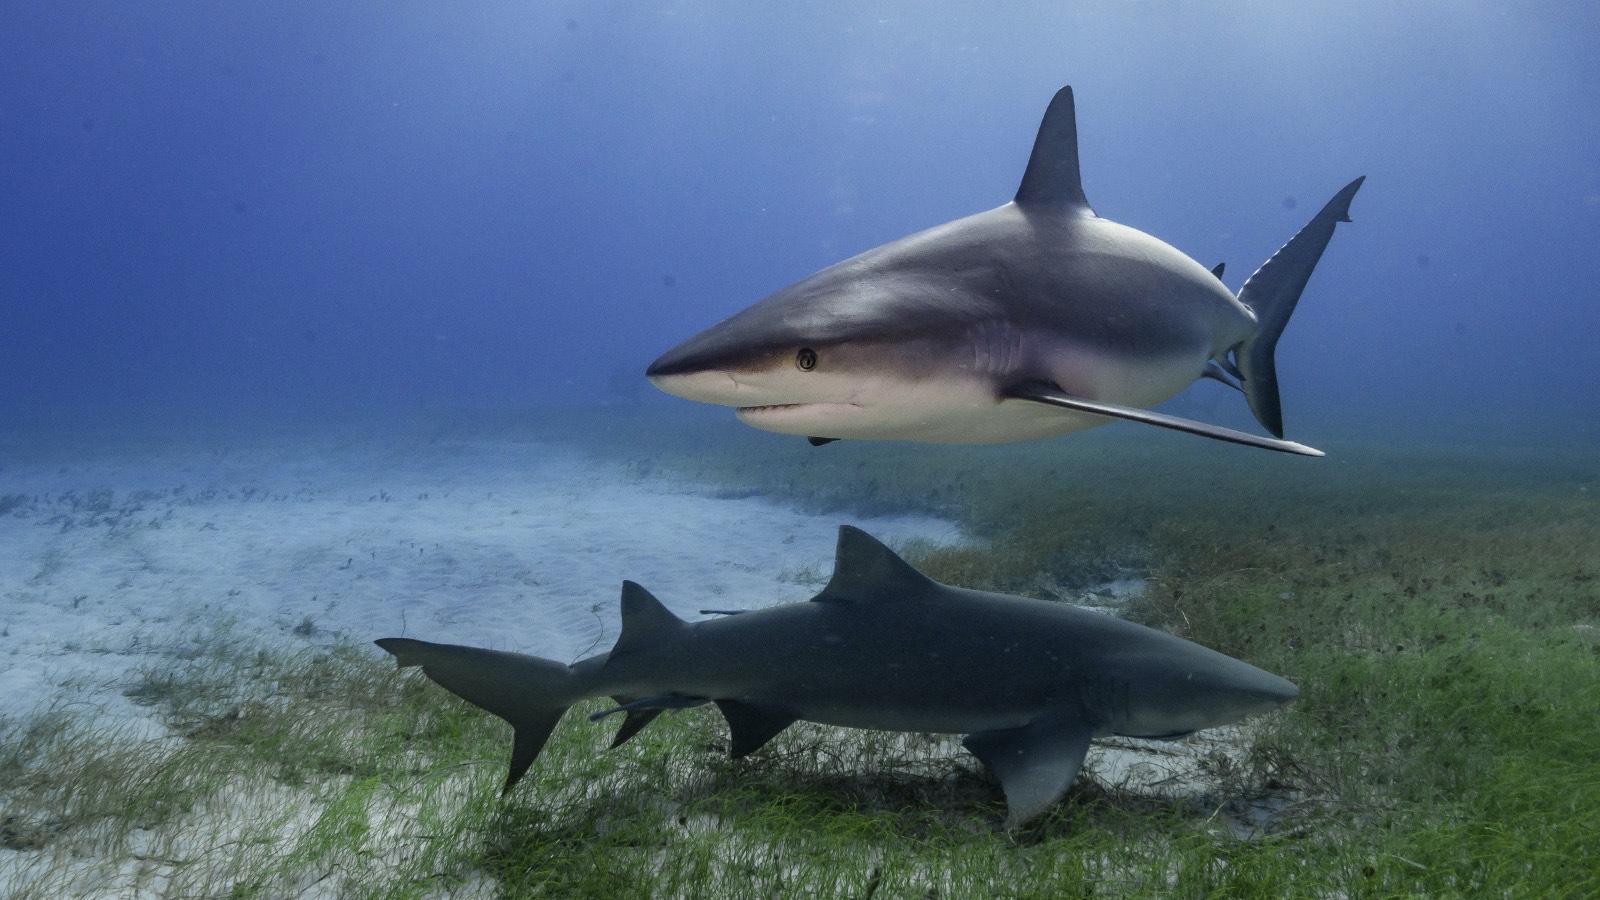 Example of Carnivorous Heterotroph Sharks